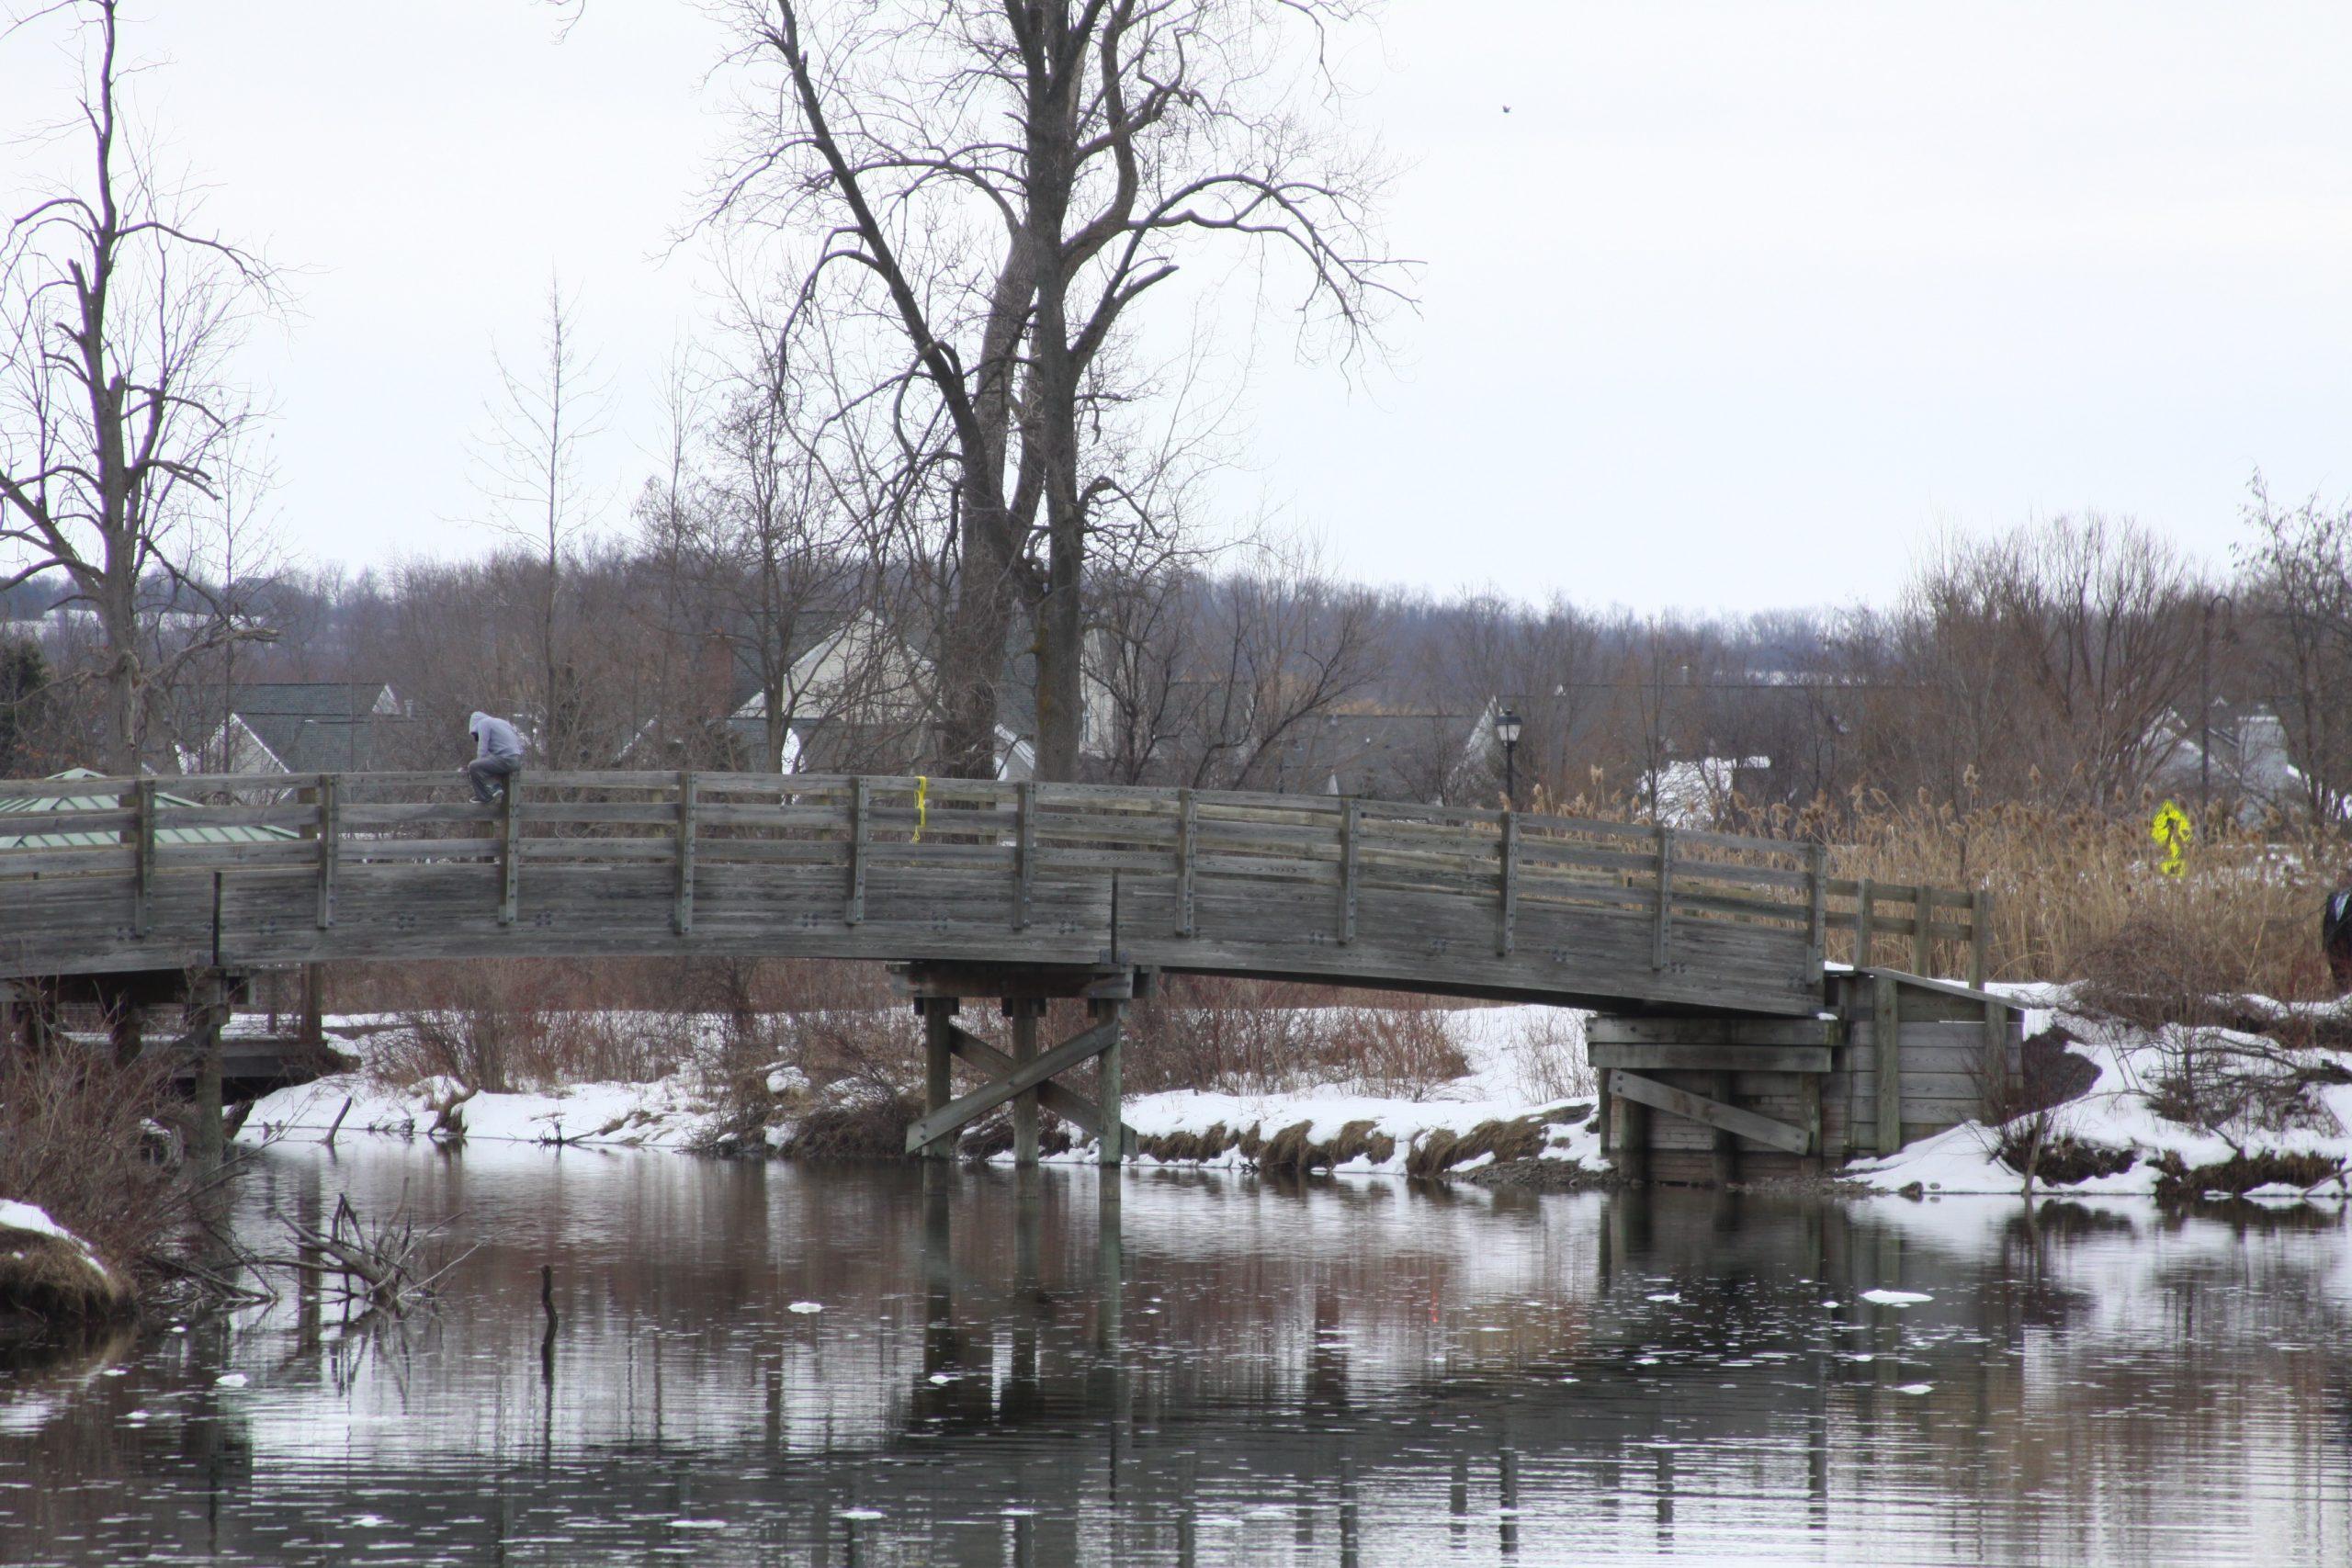 Incident on Canandaigua Bridge Ends Peacefully